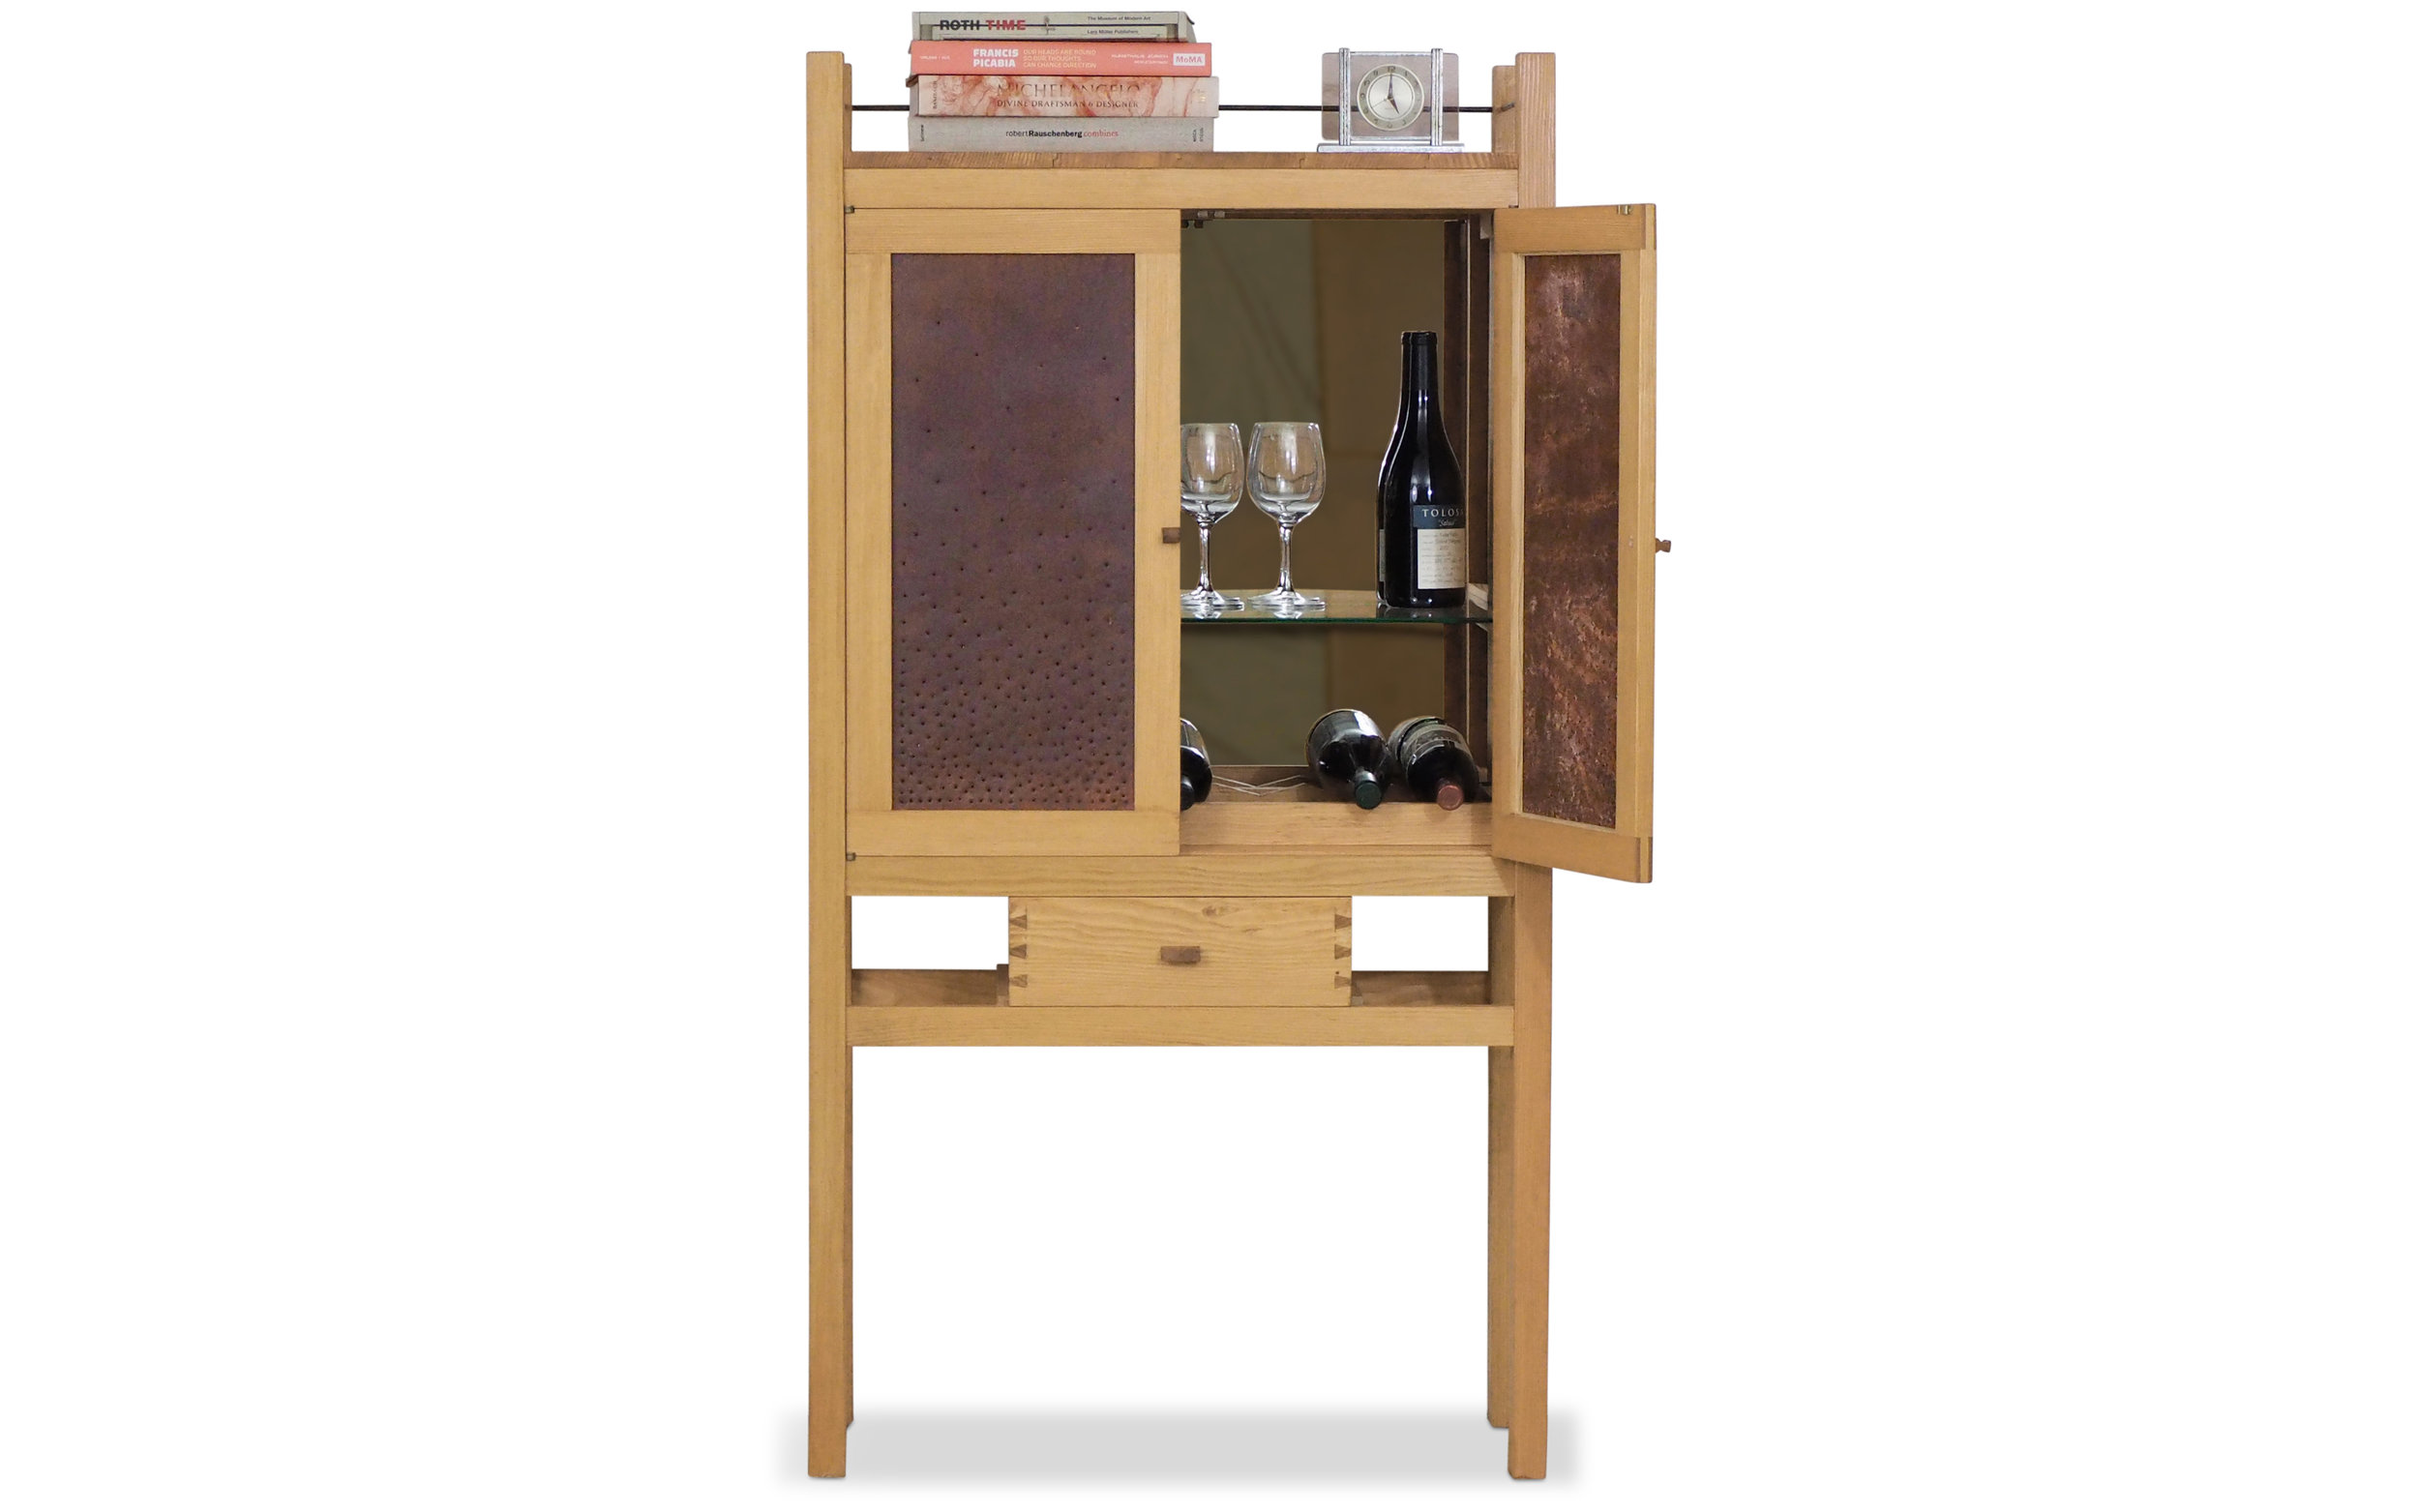 Punchwork Cabinet